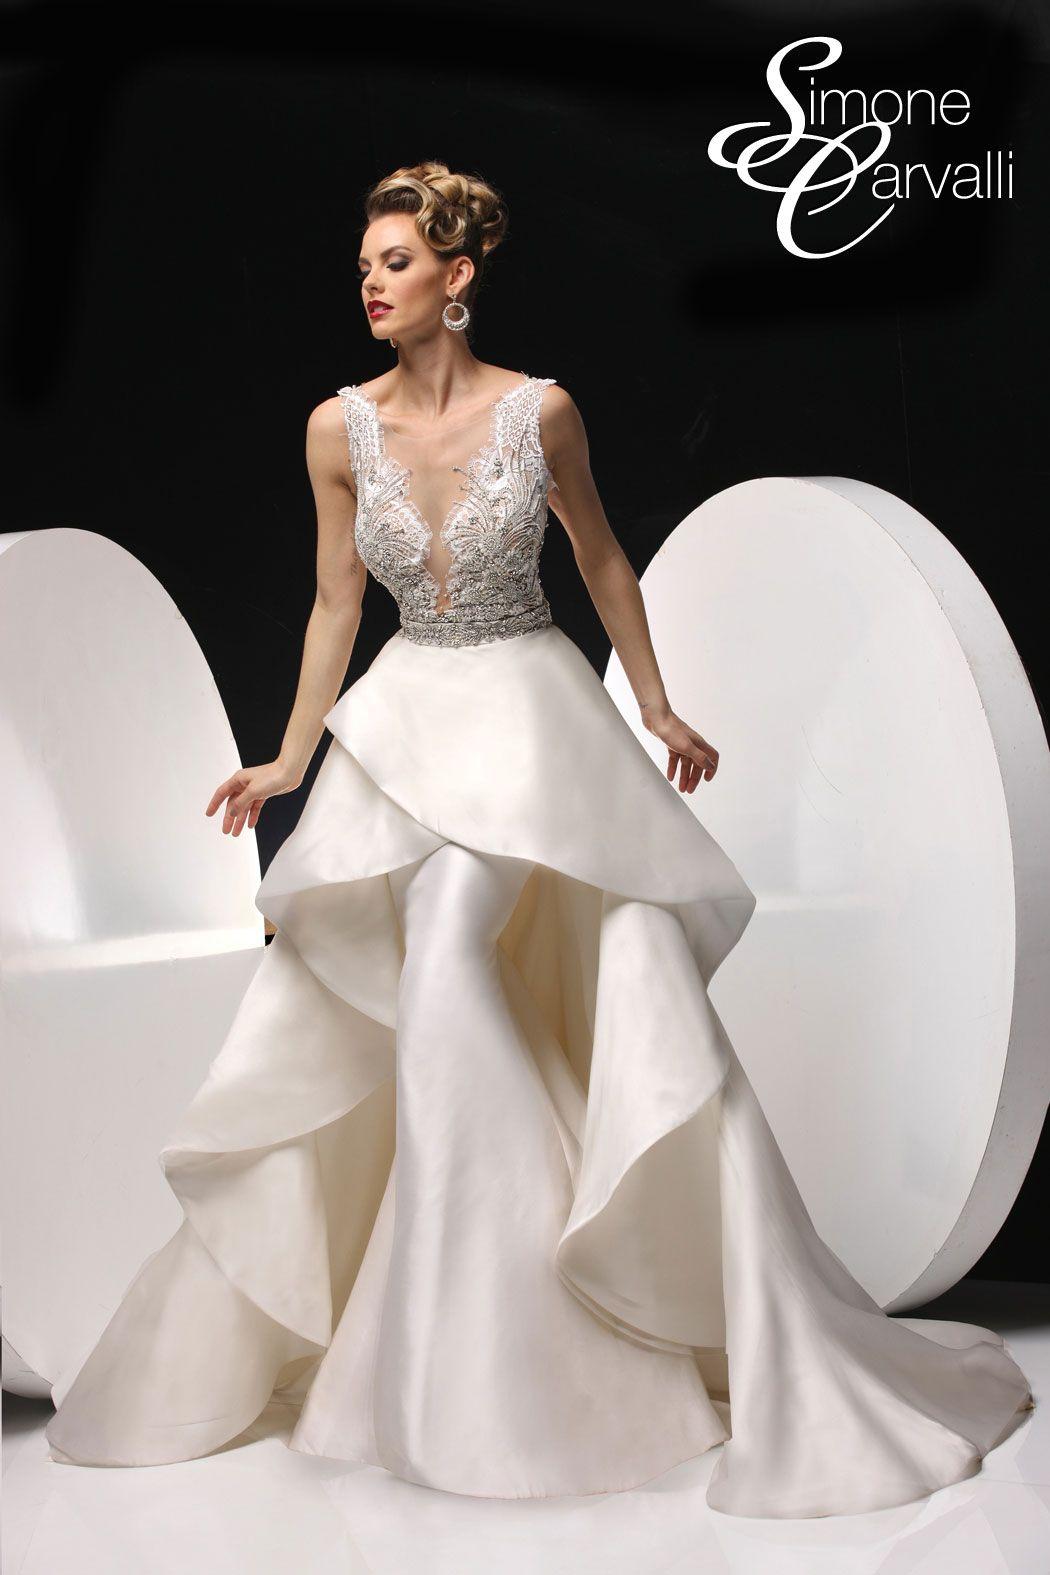 Detachable skirt wedding dress  Simone Carvalli  w Detachable Skirt wedding dress